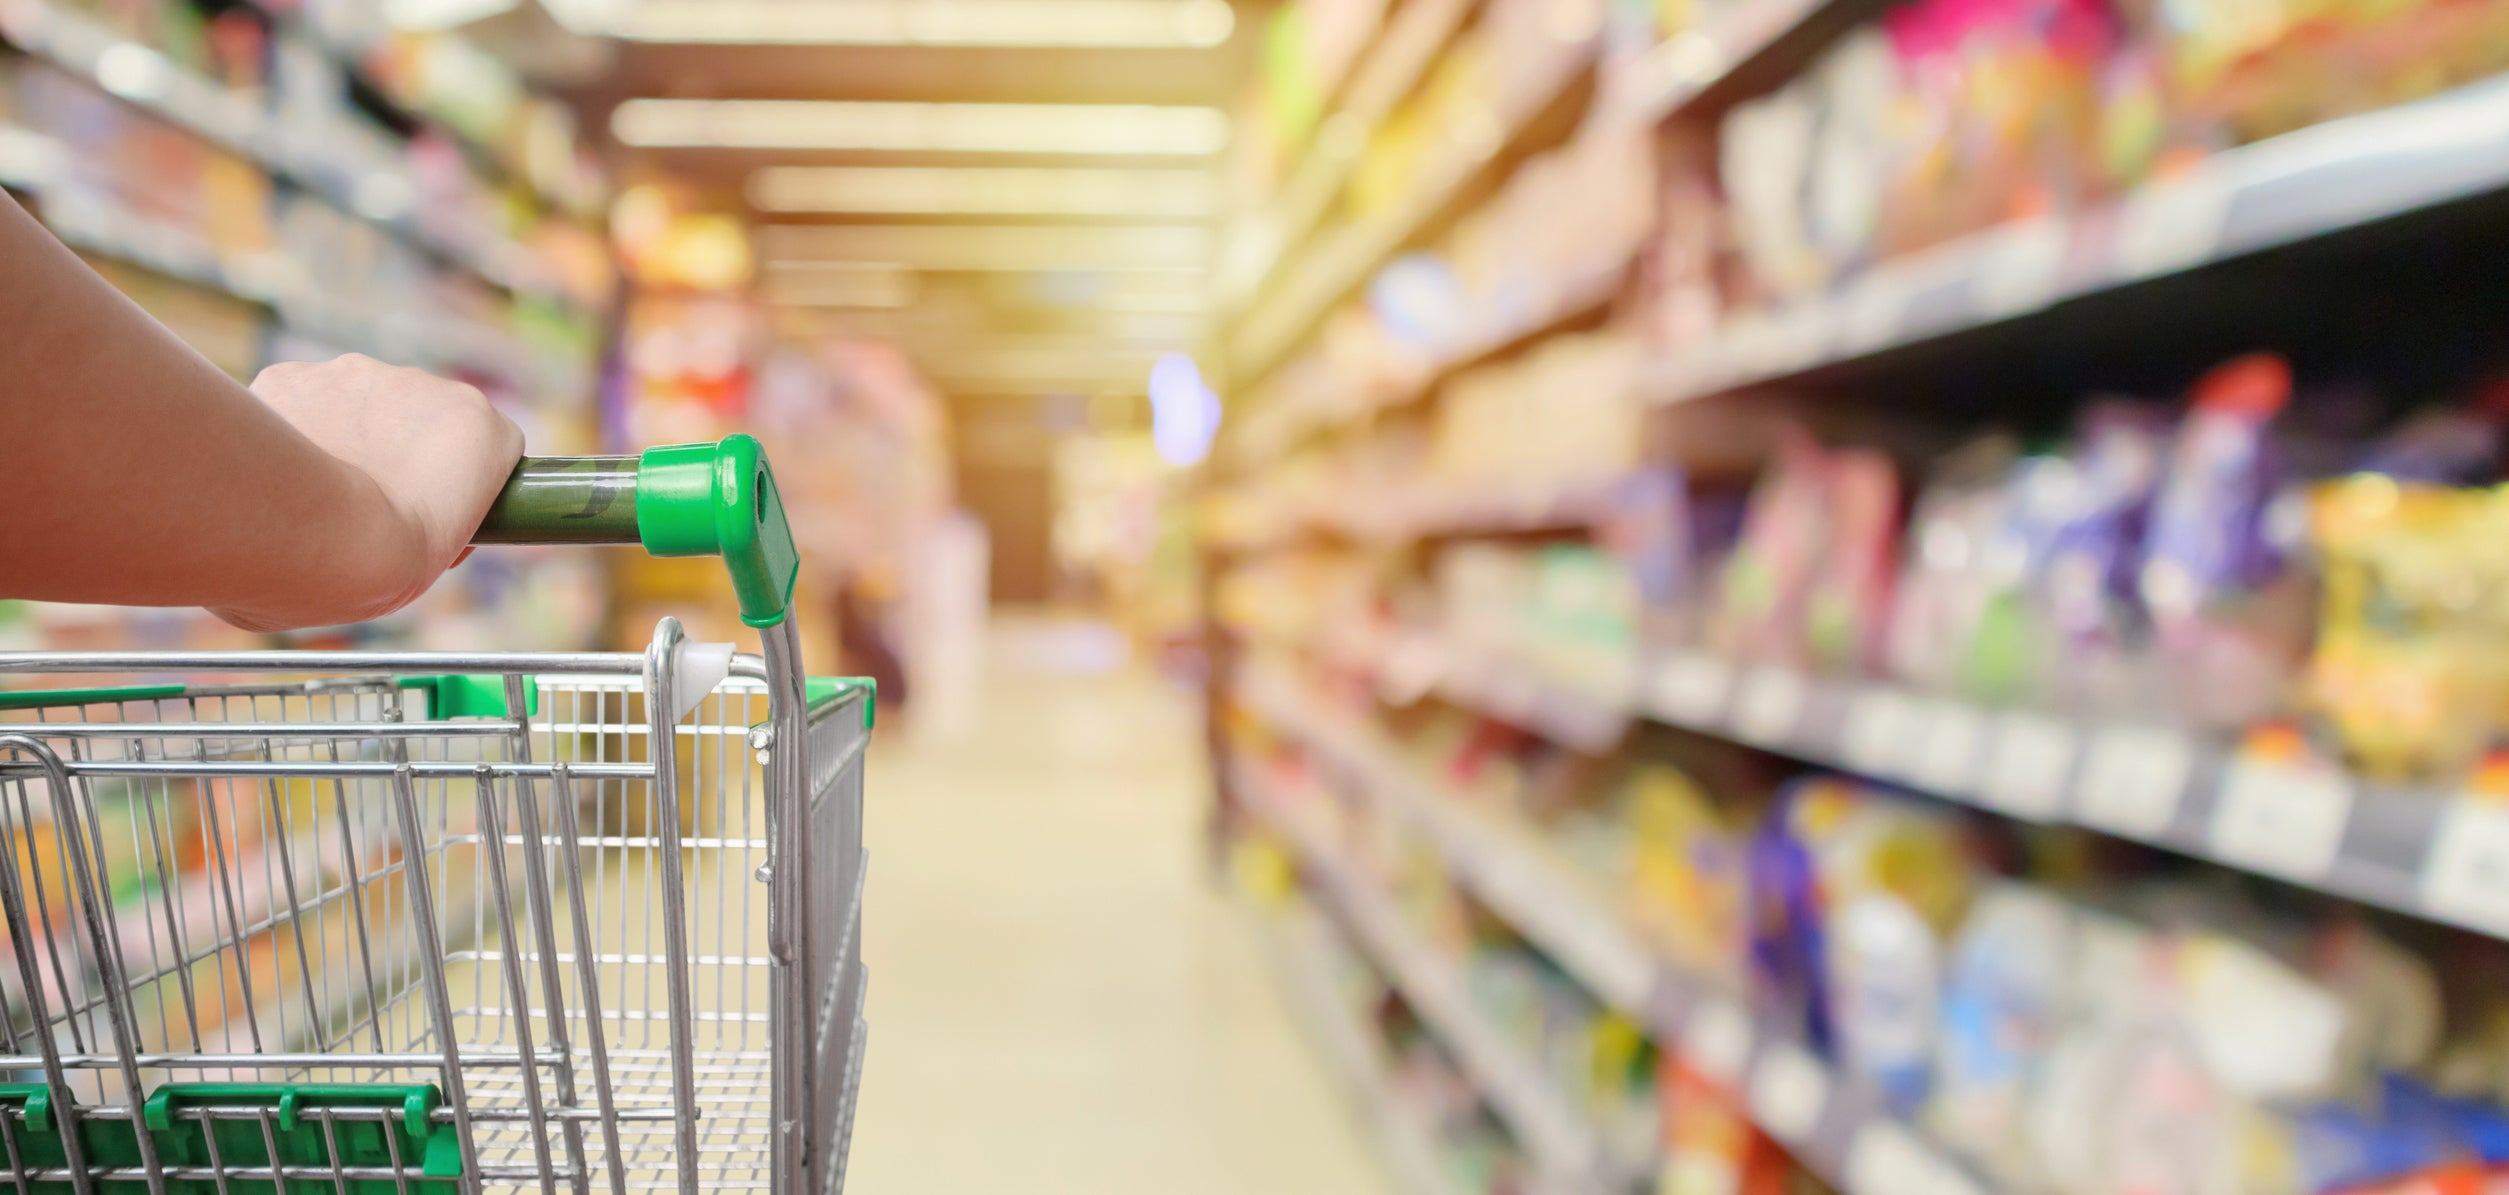 Better Buy: Procter & Gamble vs. Unilever | The Motley Fool